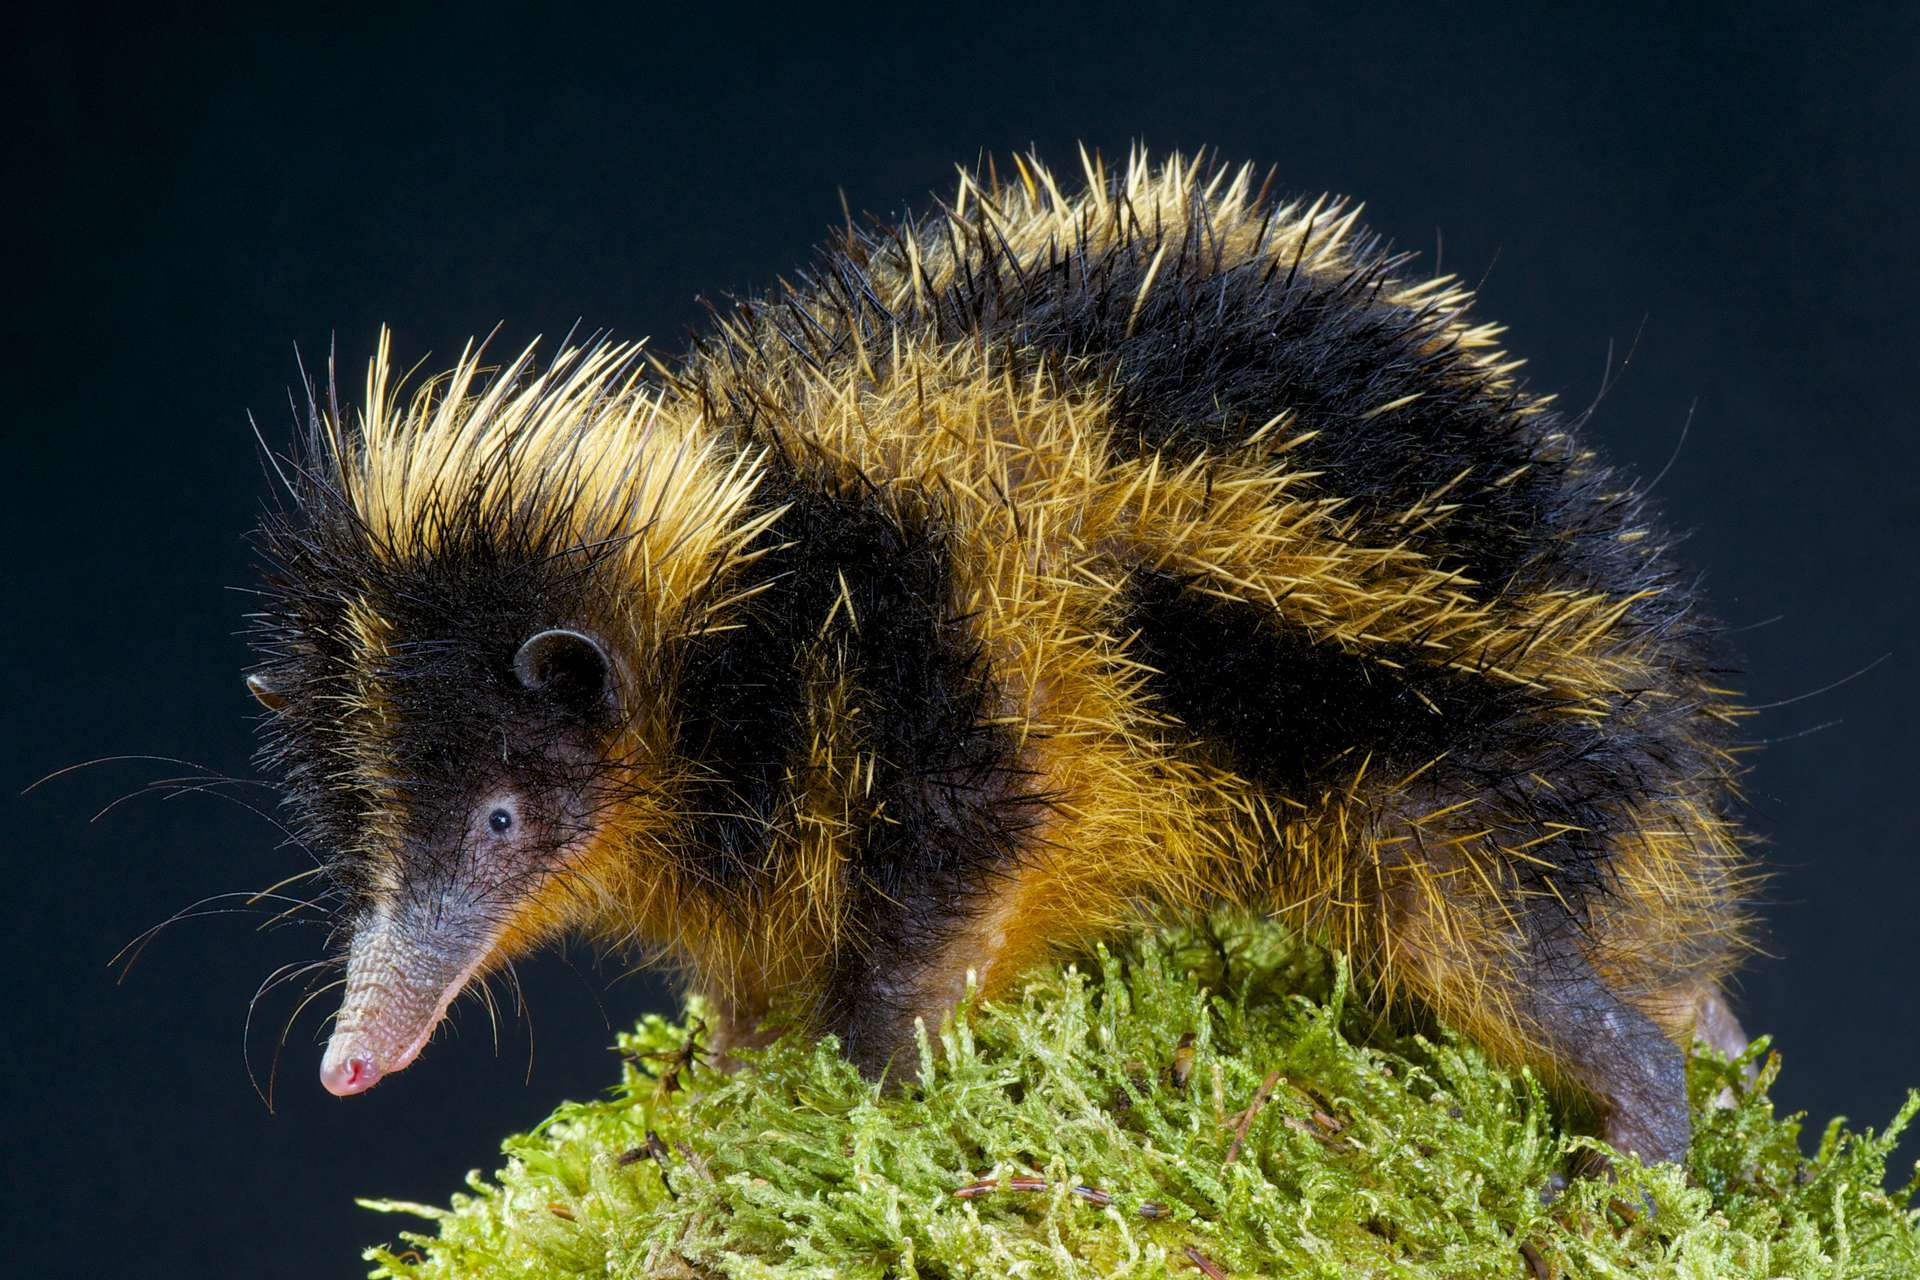 Un tenrec zébré adulte, petit mammifère endémique de Madagascar. © mgkuijpers, Adobe Stock